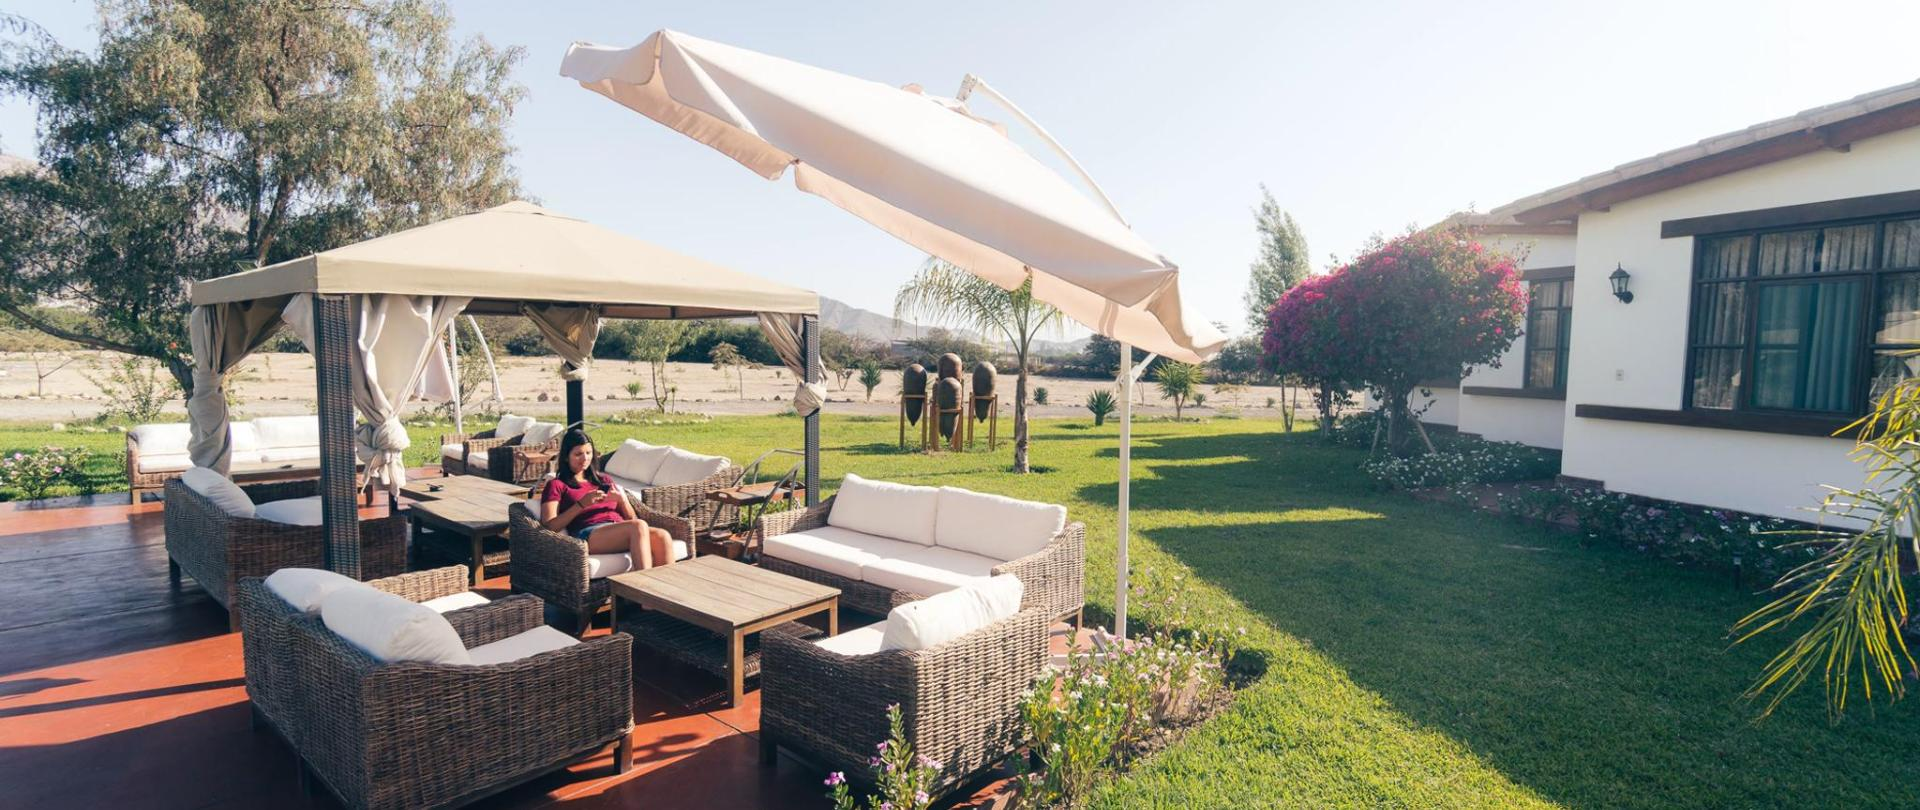 Casa Hacienda Nazca Oasis-4 mas pequeño.jpg